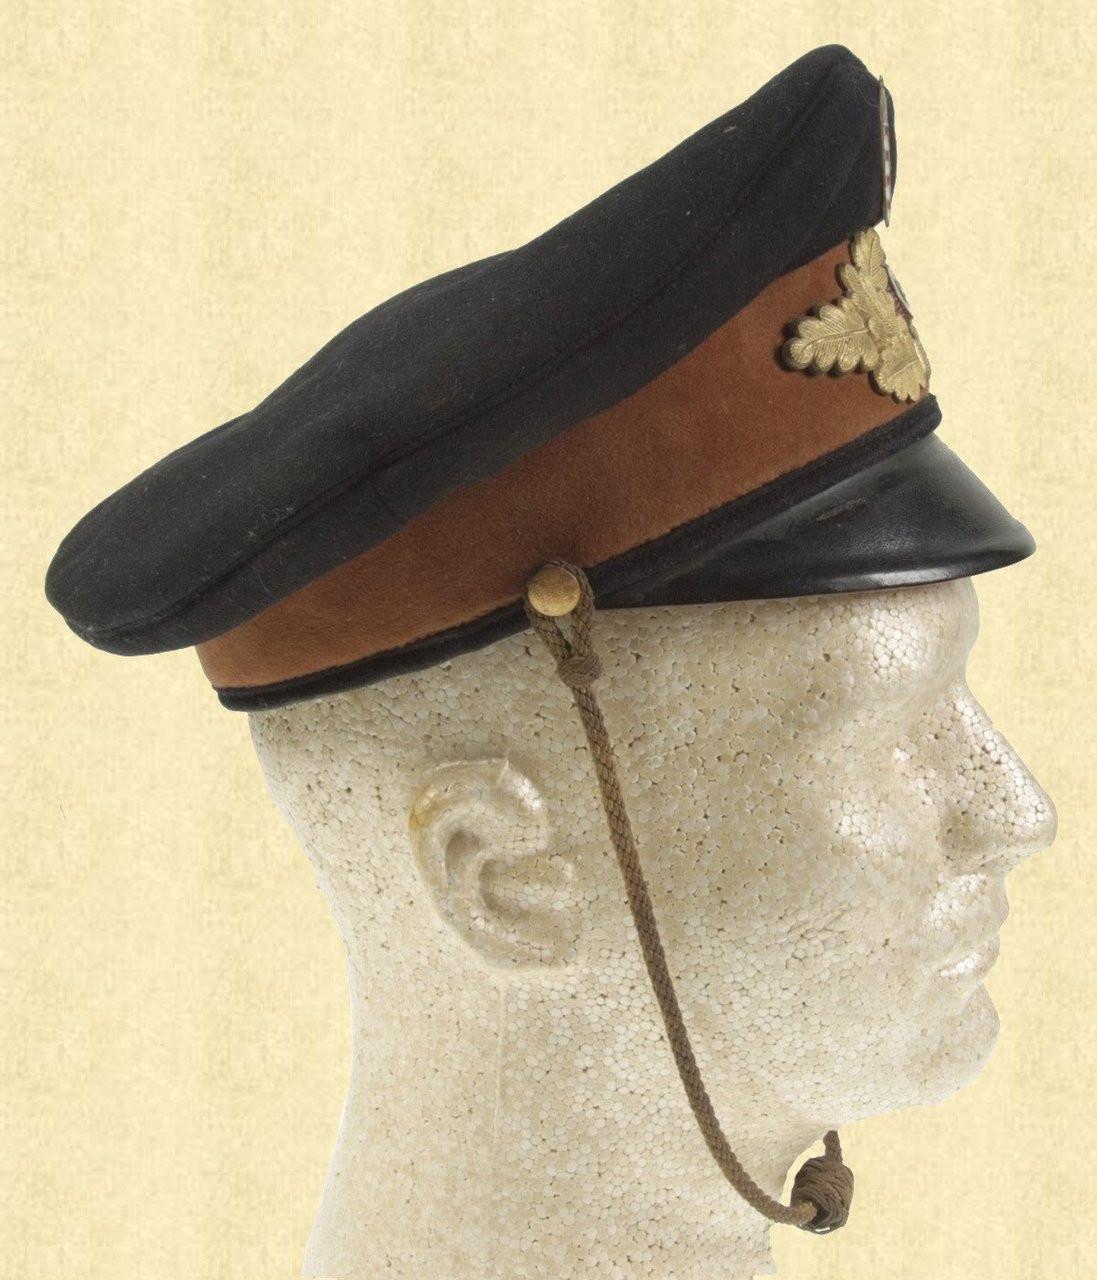 GERMAN VISOR HAT - C9666